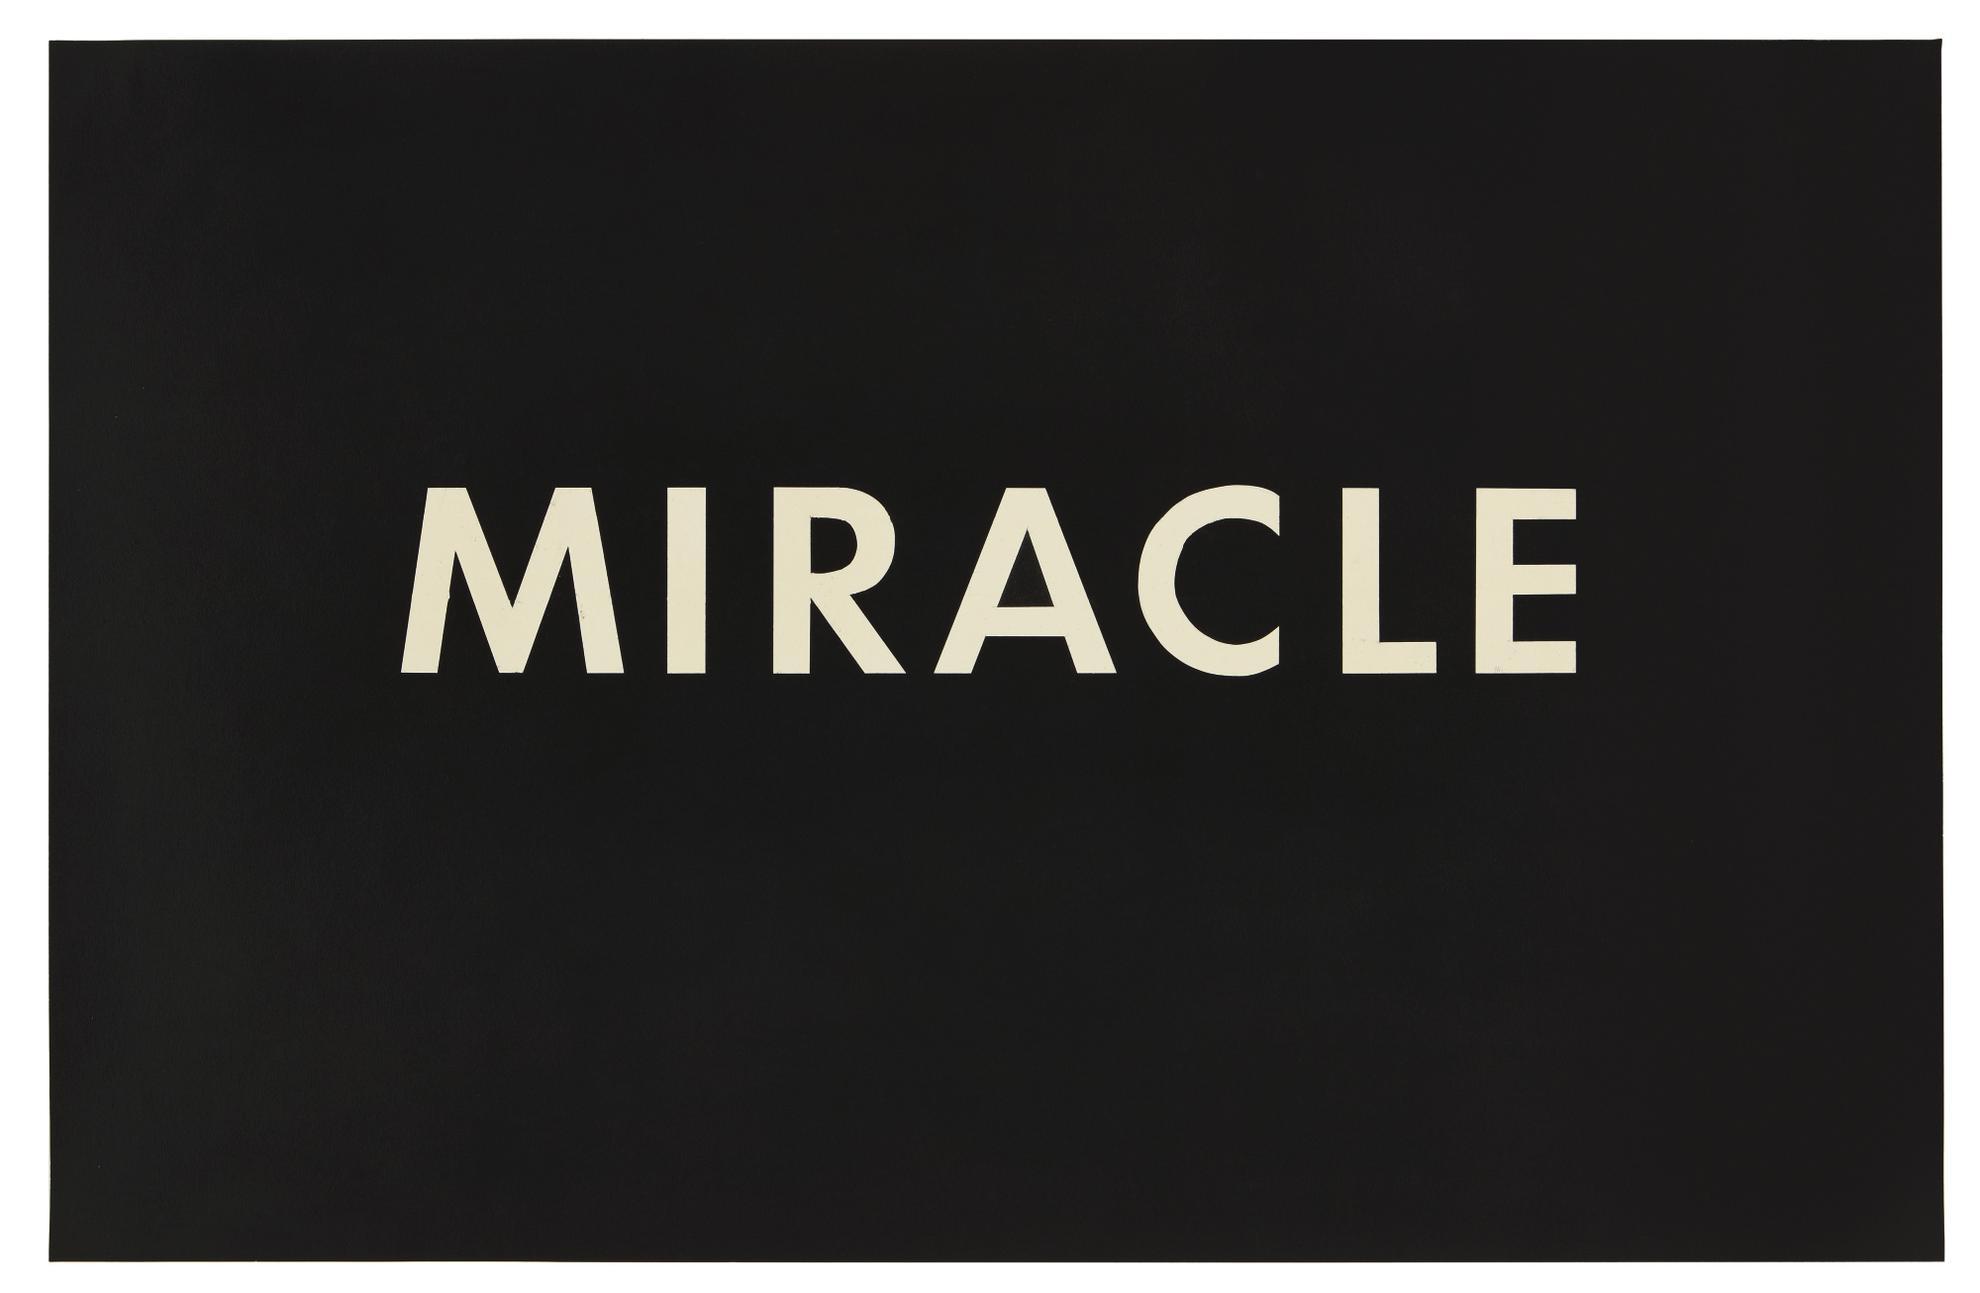 Ed Ruscha-Miracle-1975